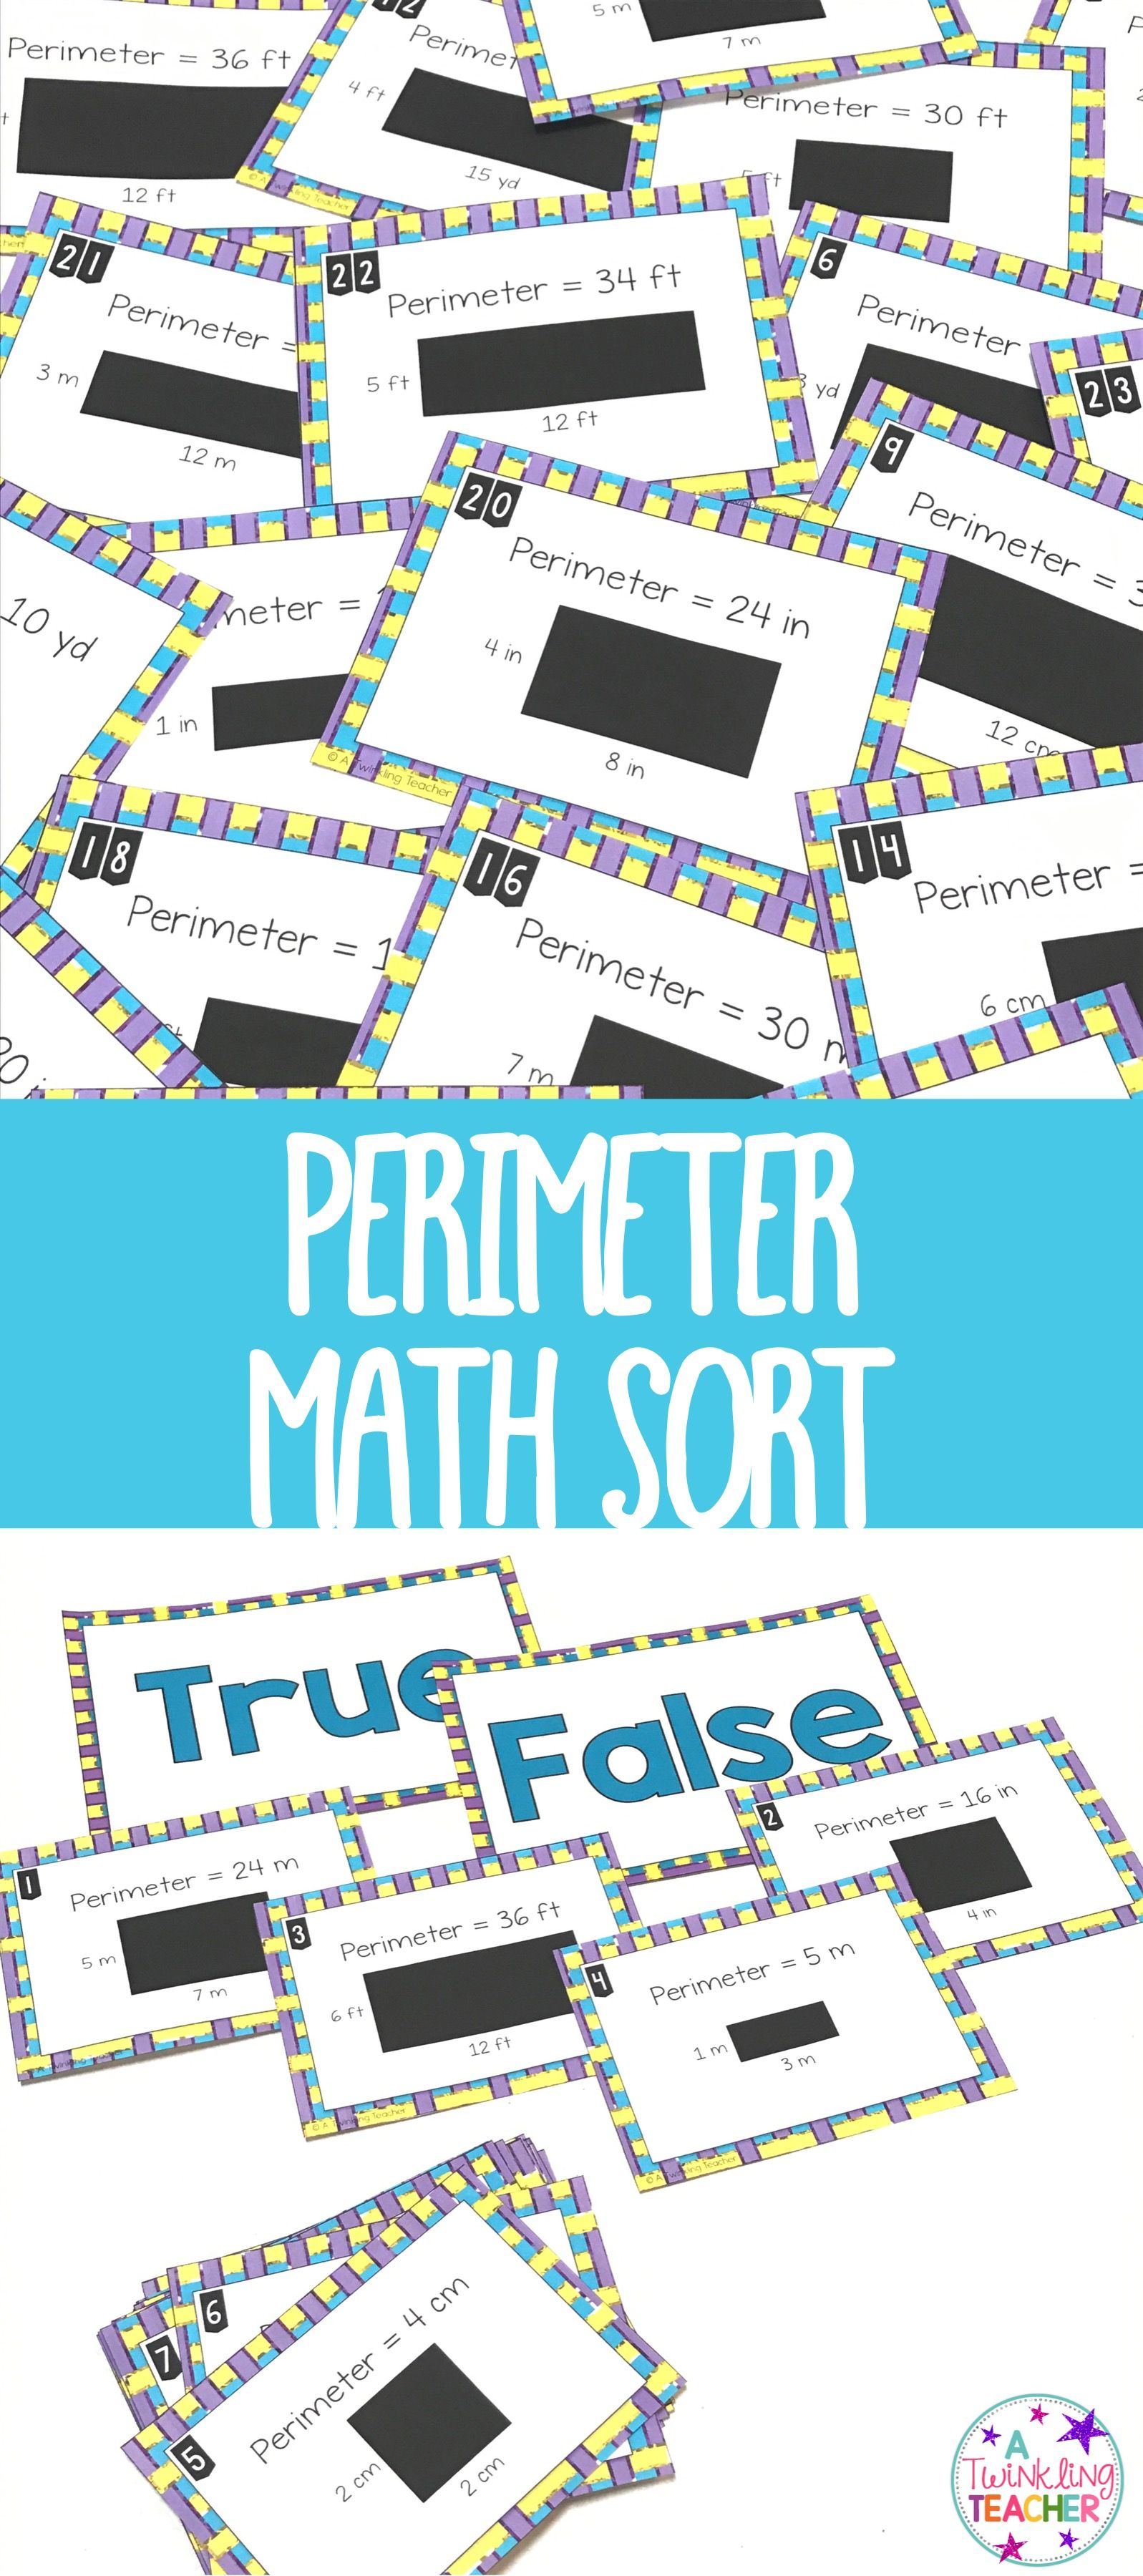 Perimeter true false math center sort | Math, Activities and Students